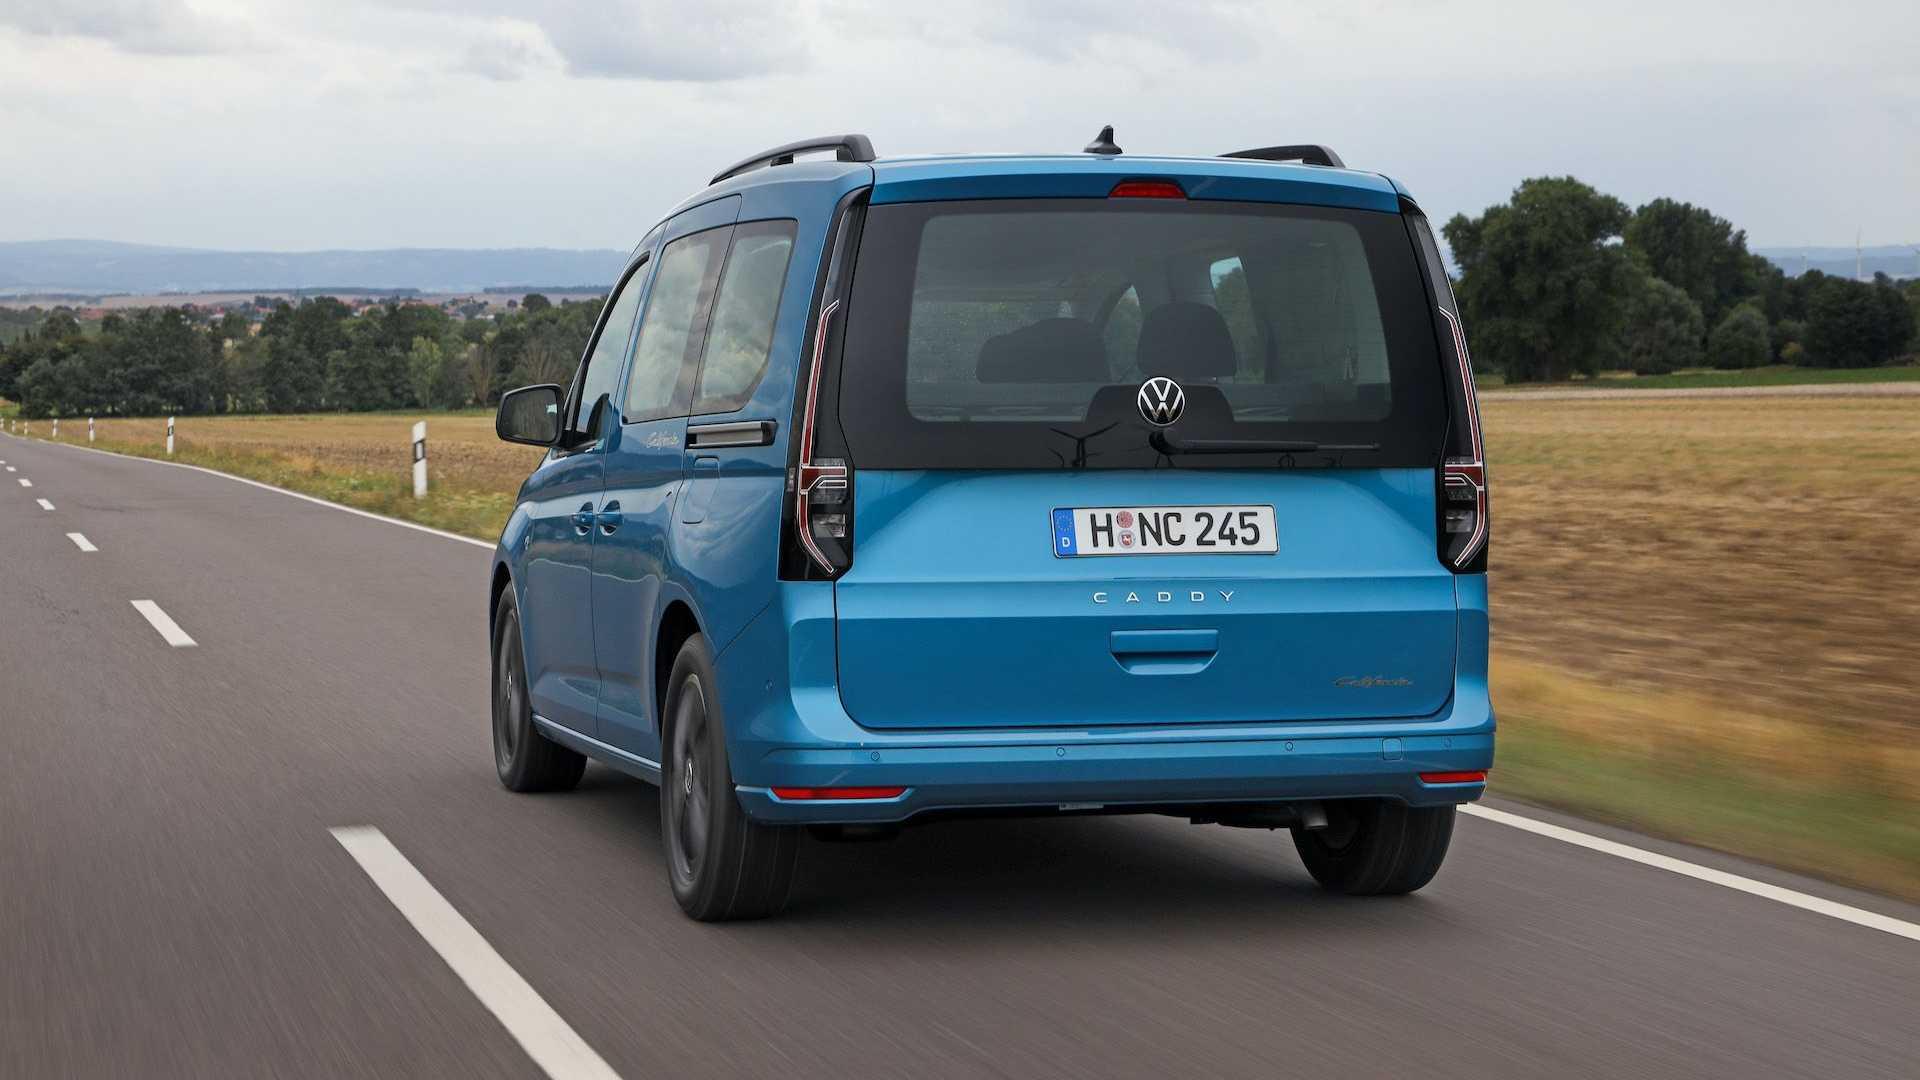 2021 VW Caddy California竟然具備了難以想像的露營機能擴充性 | SanjiNoir 黑侍樂讀|